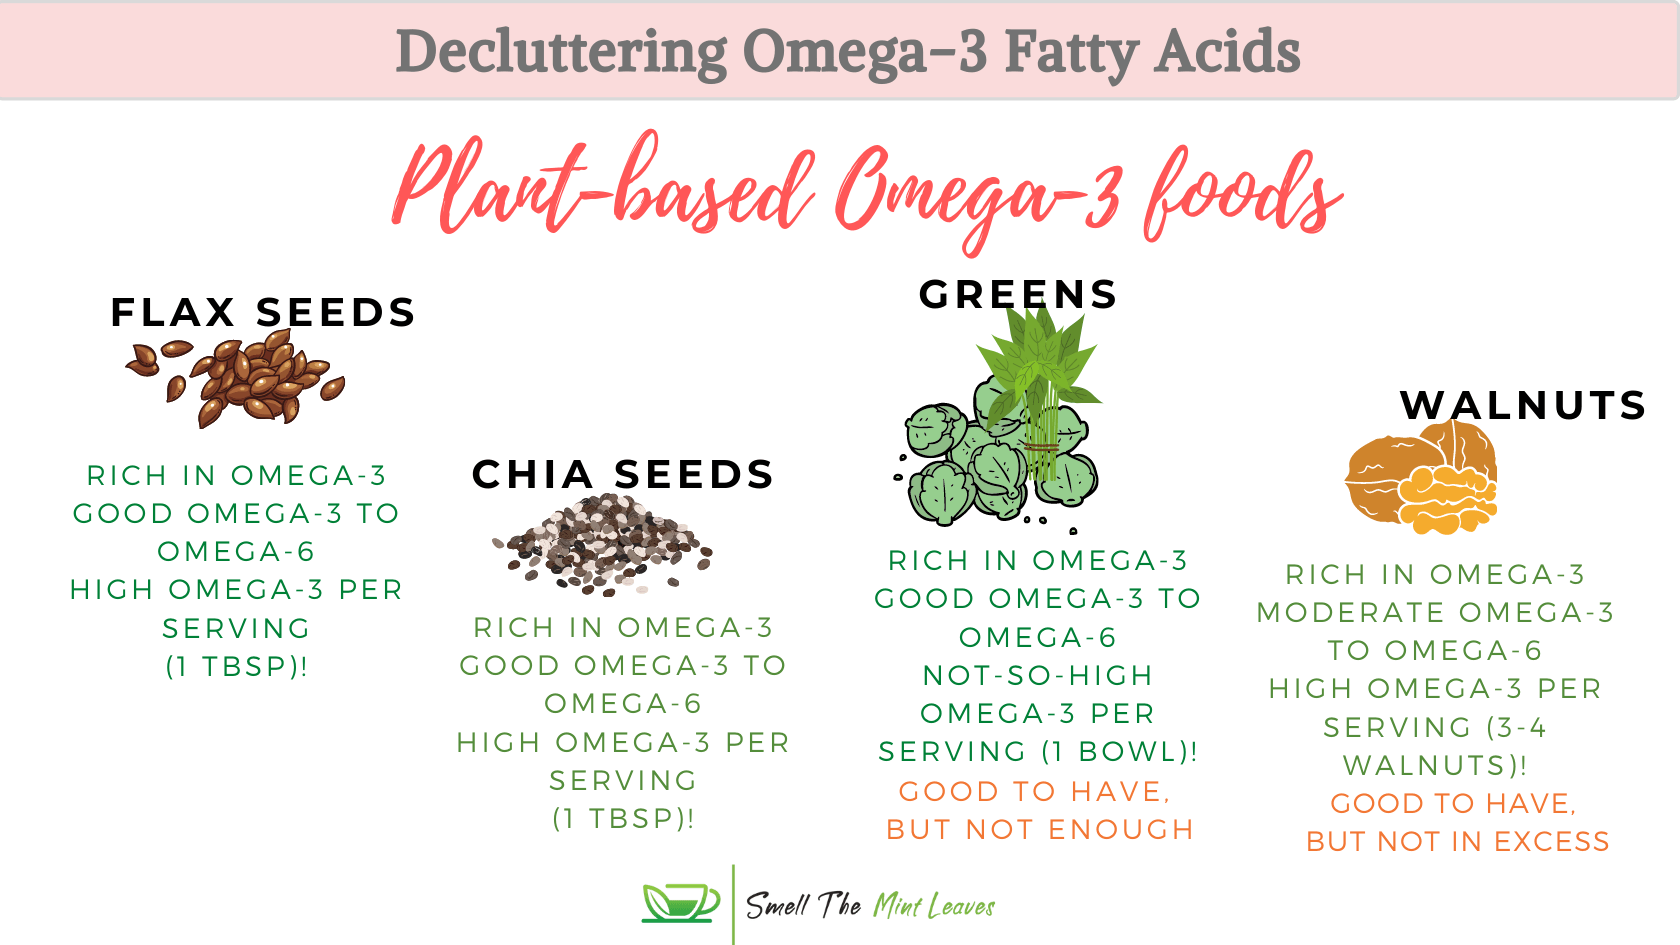 Omega-3 fatty acids sources